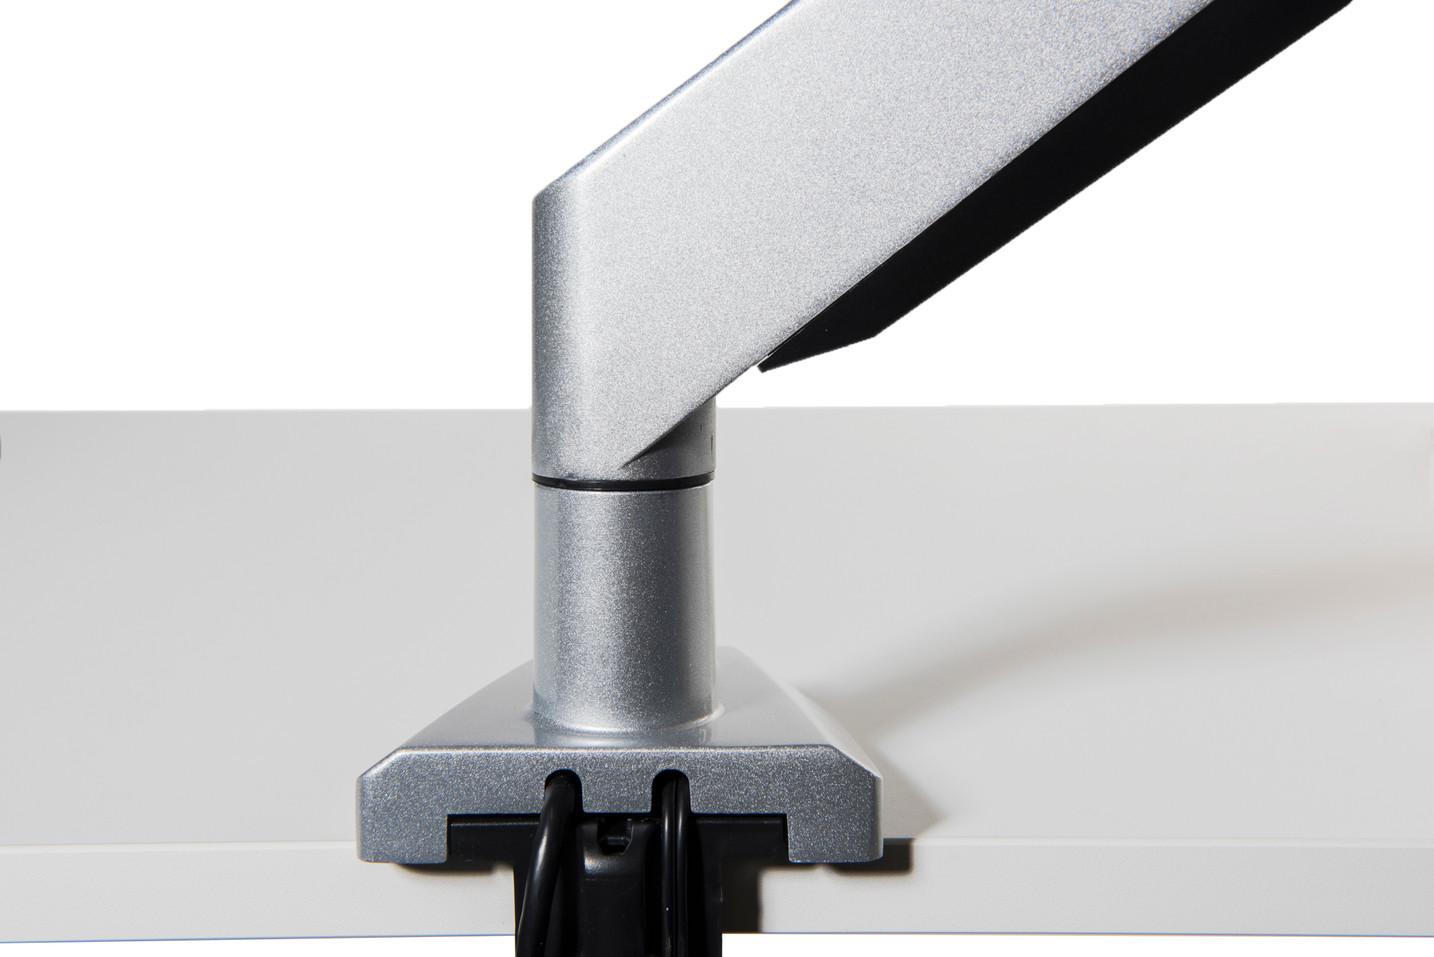 smart-office-11-single-monitor-arm-monit